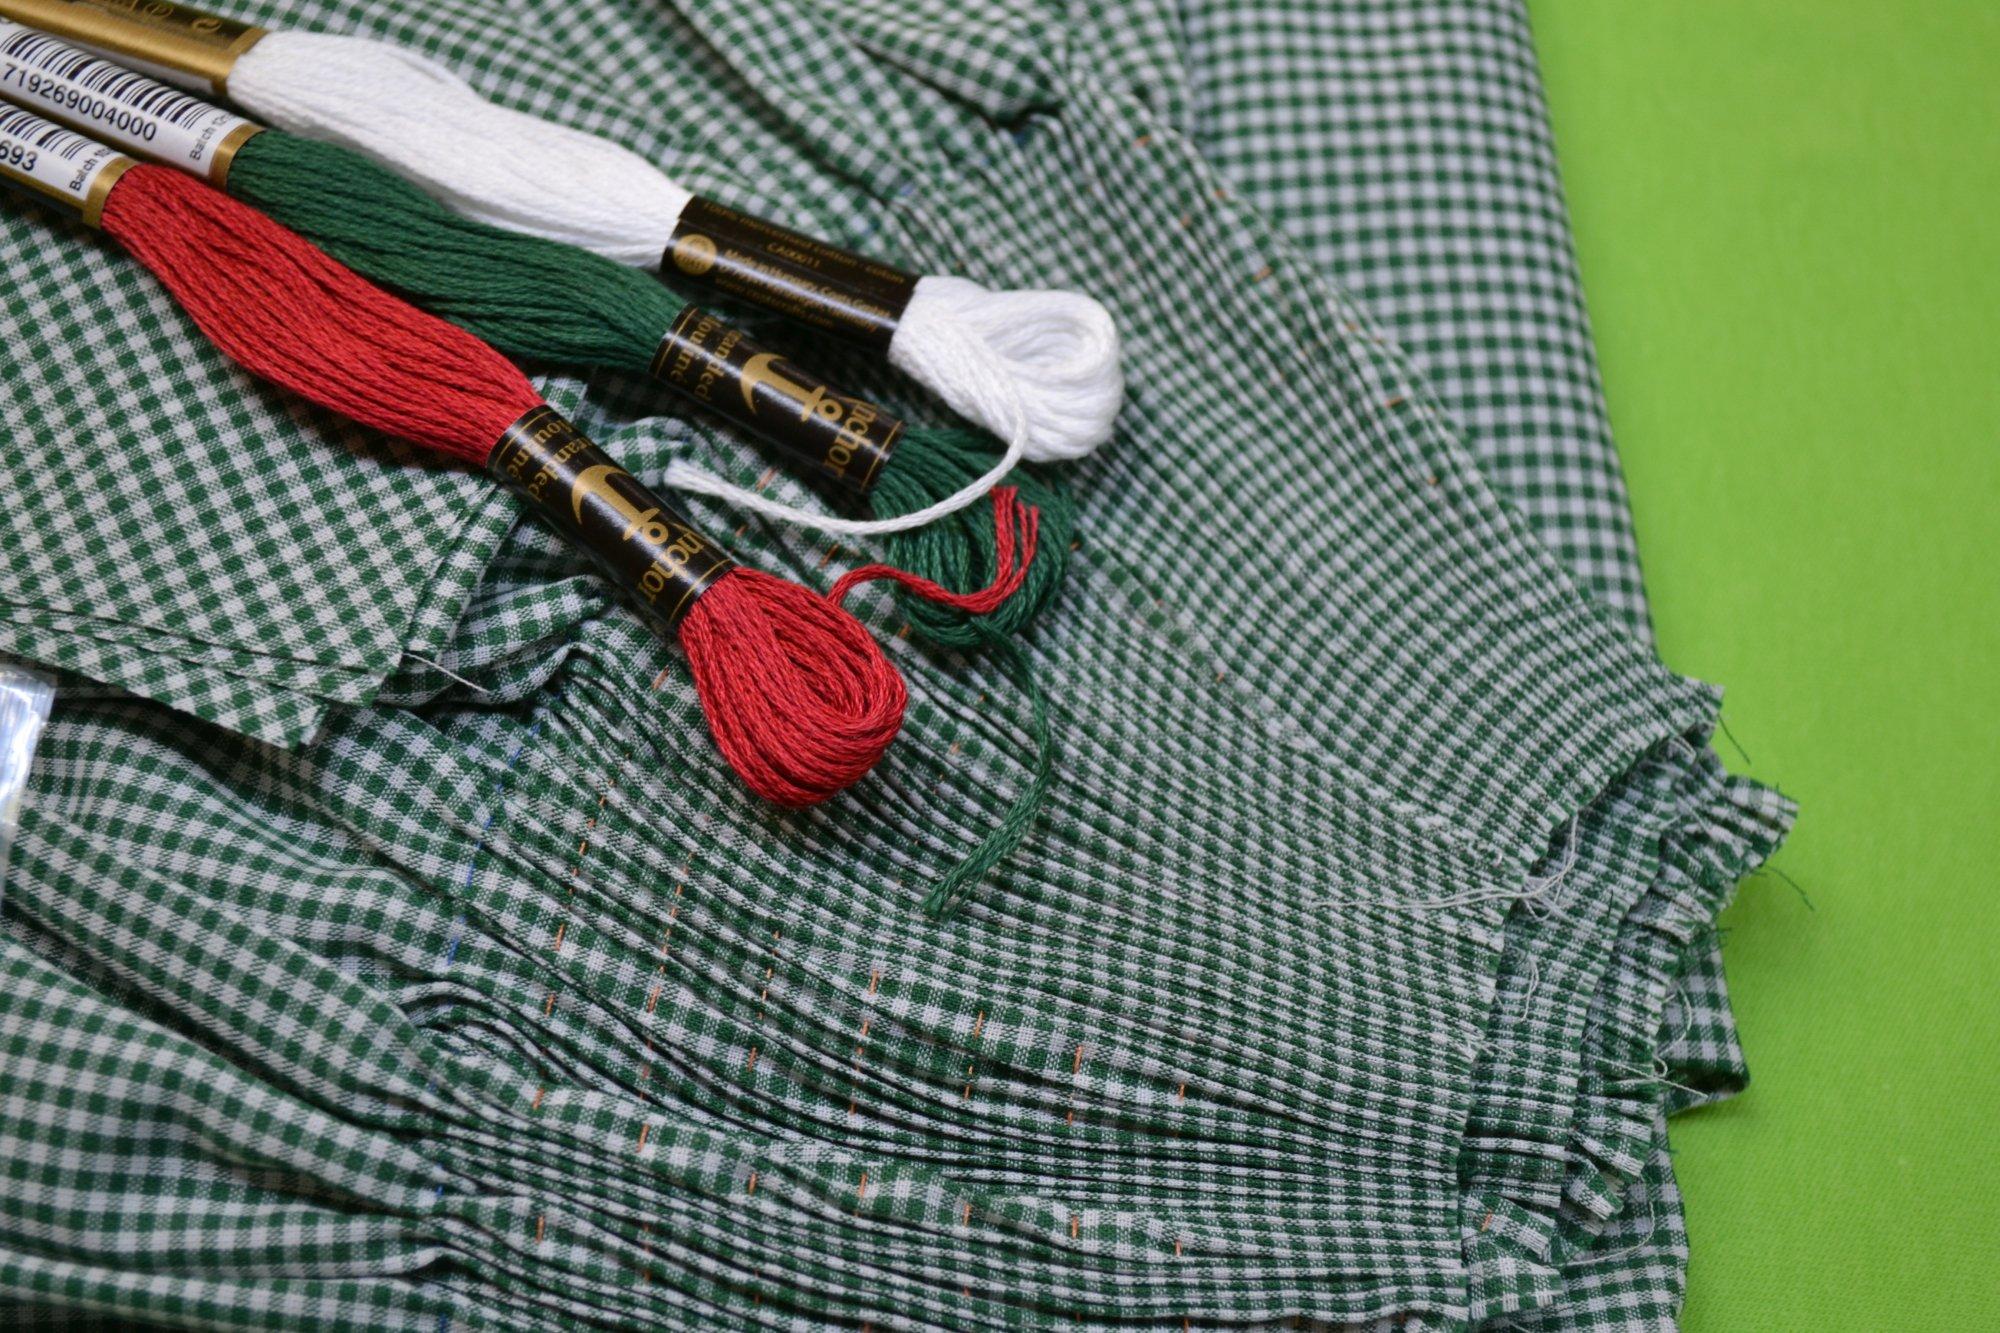 Bishop Kit - Banded Sleeve Green Gingham 4 years